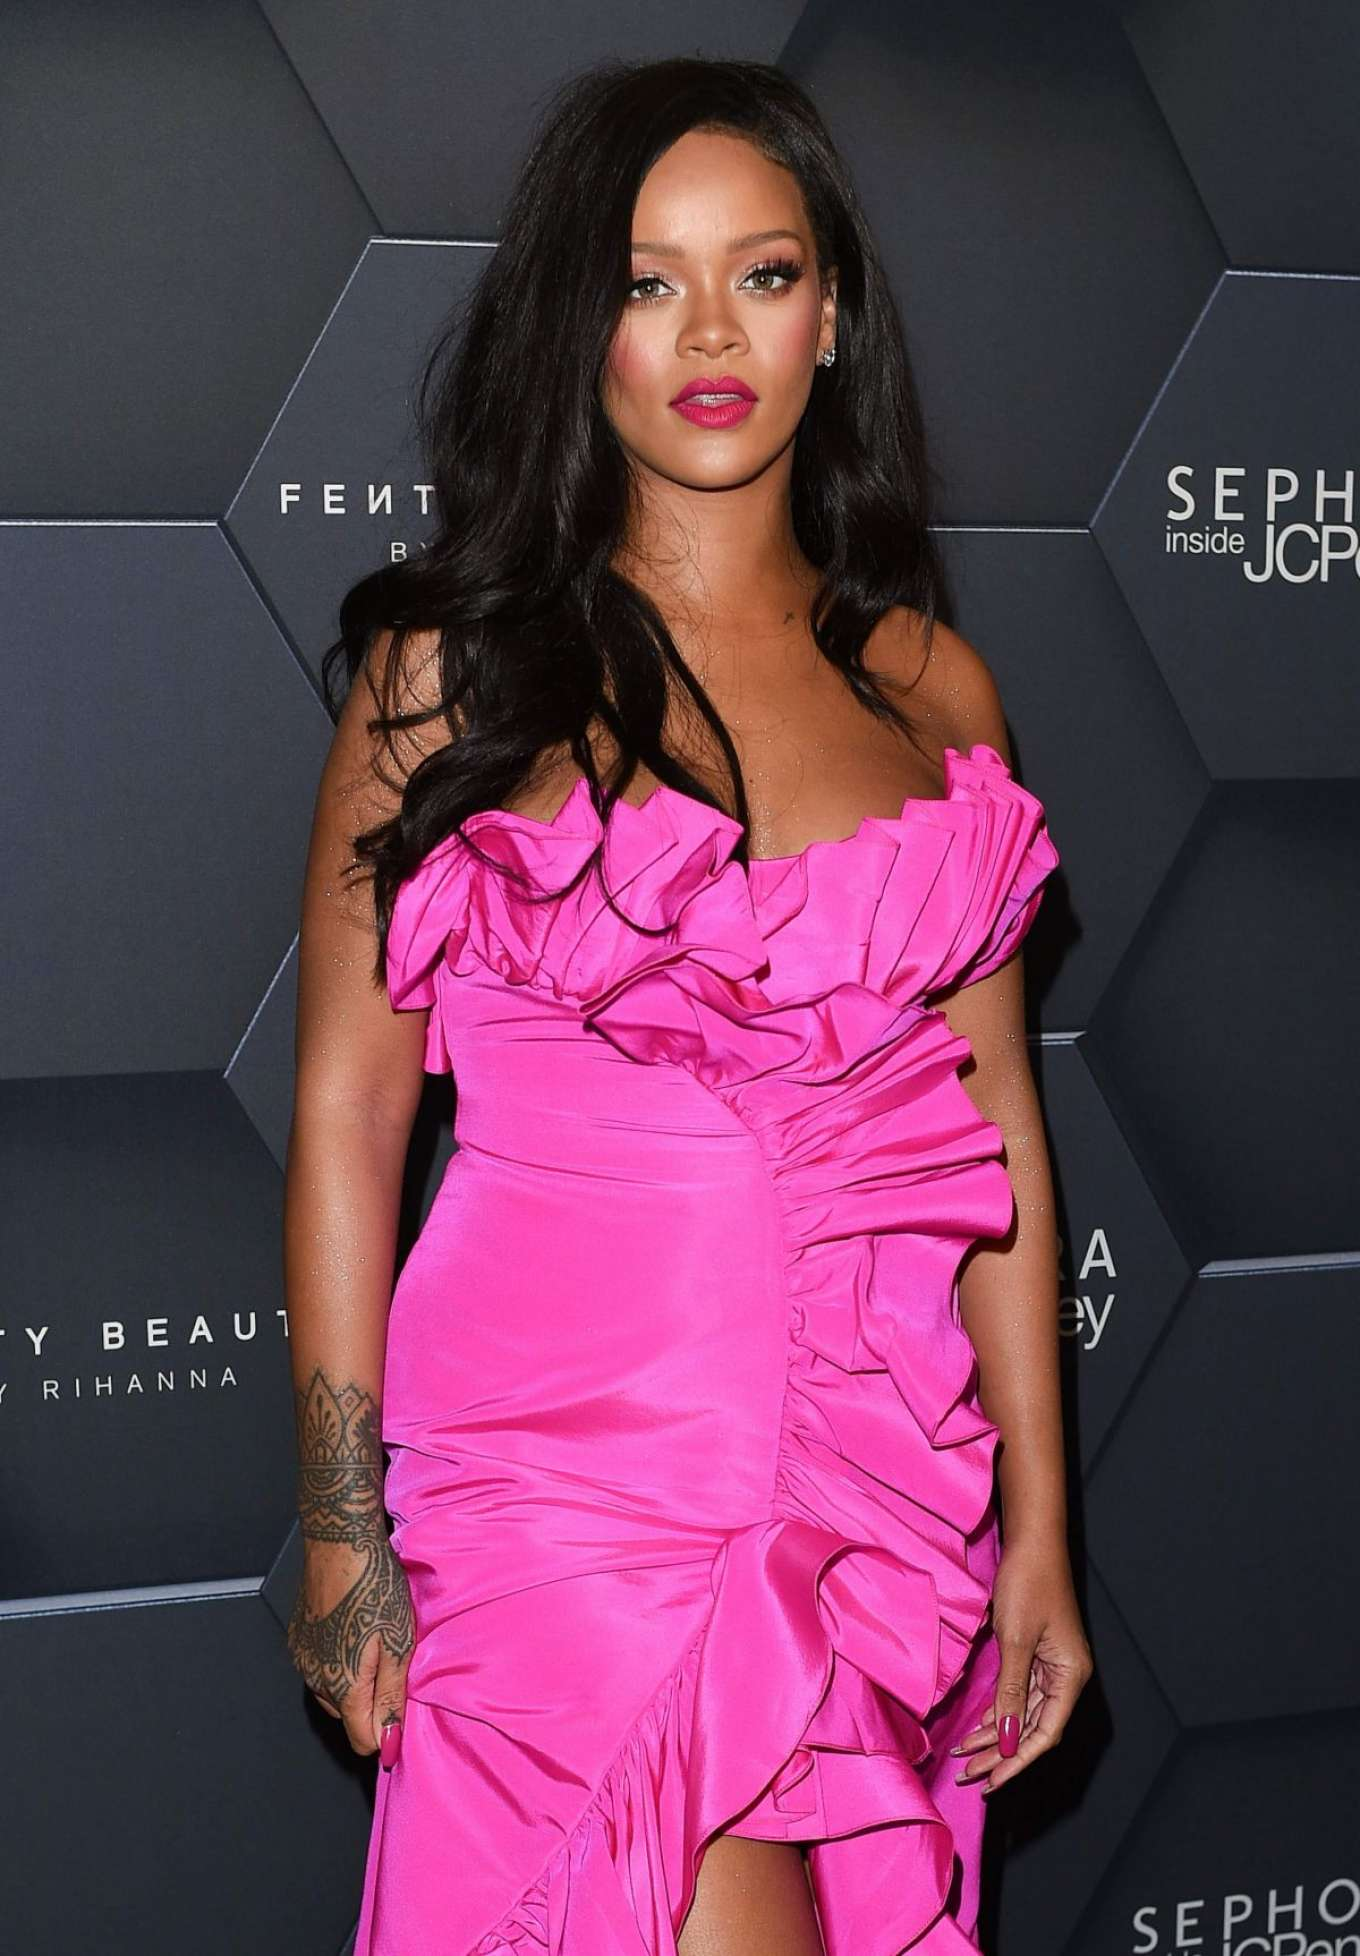 Rihanna - Celebrates Fenty Beauty Brand in New York